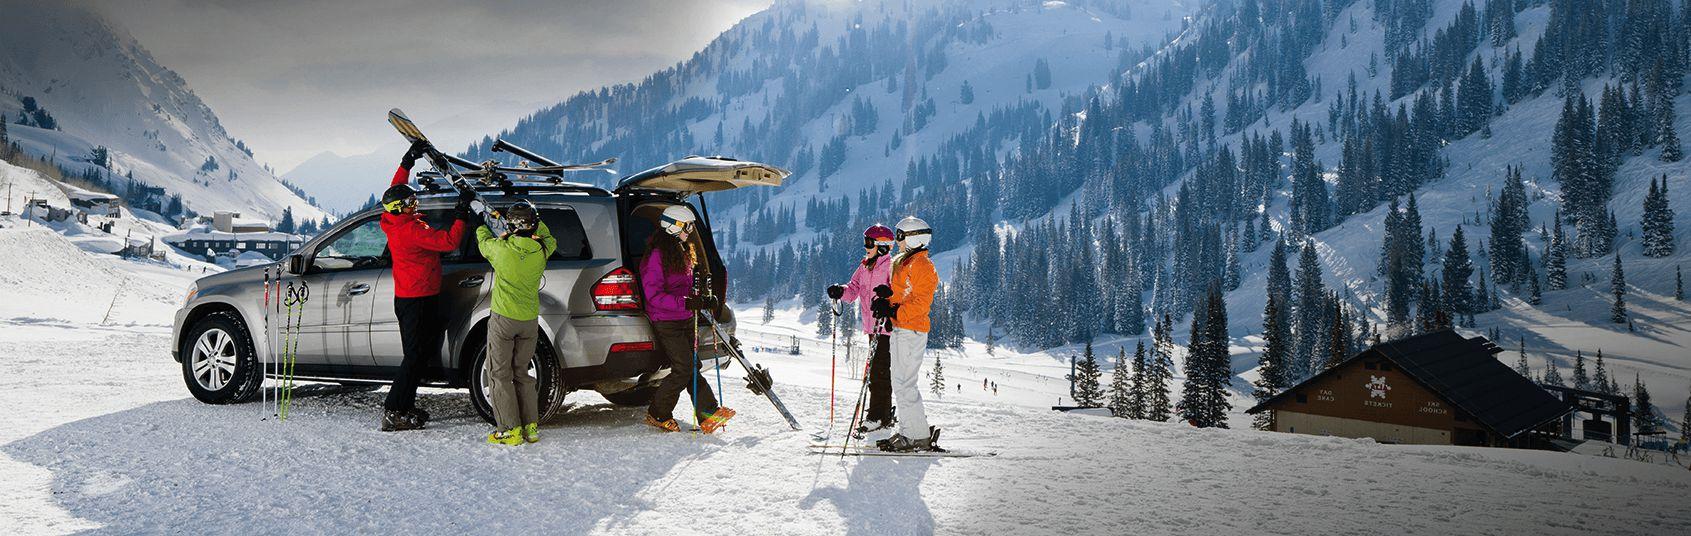 loading-skis-onto-ski-rack.jpg